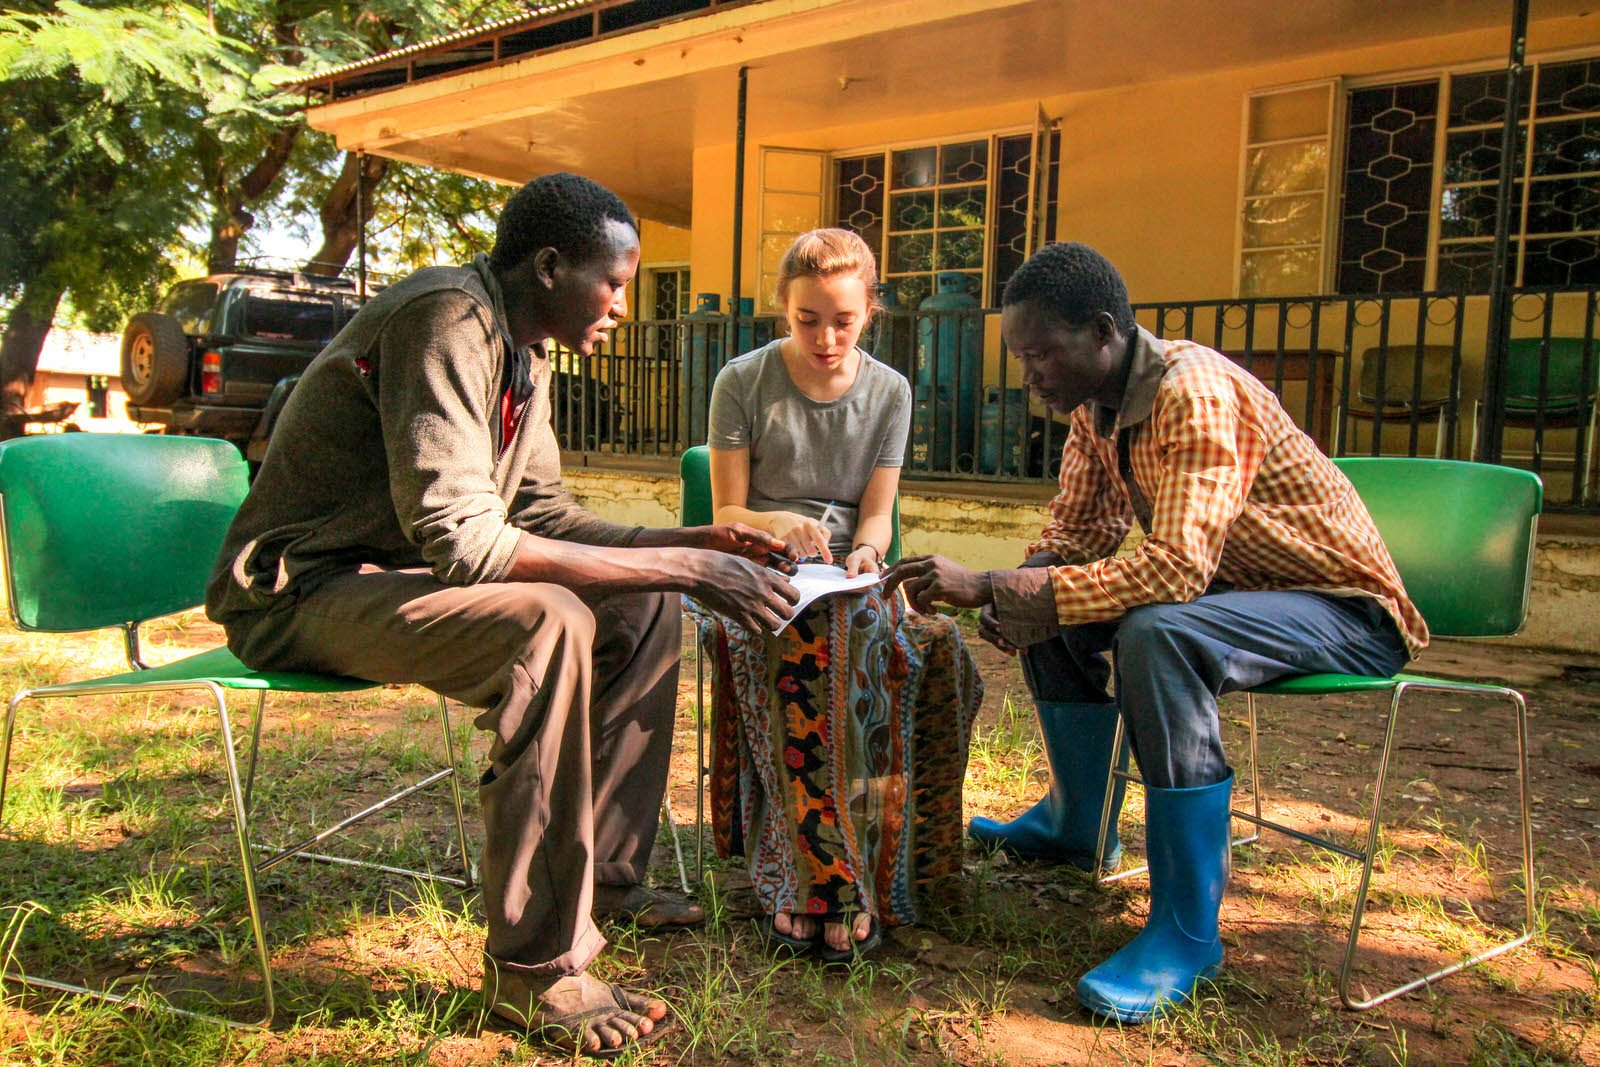 2015 Uganda testimonial photo 2 from Laura Dowds